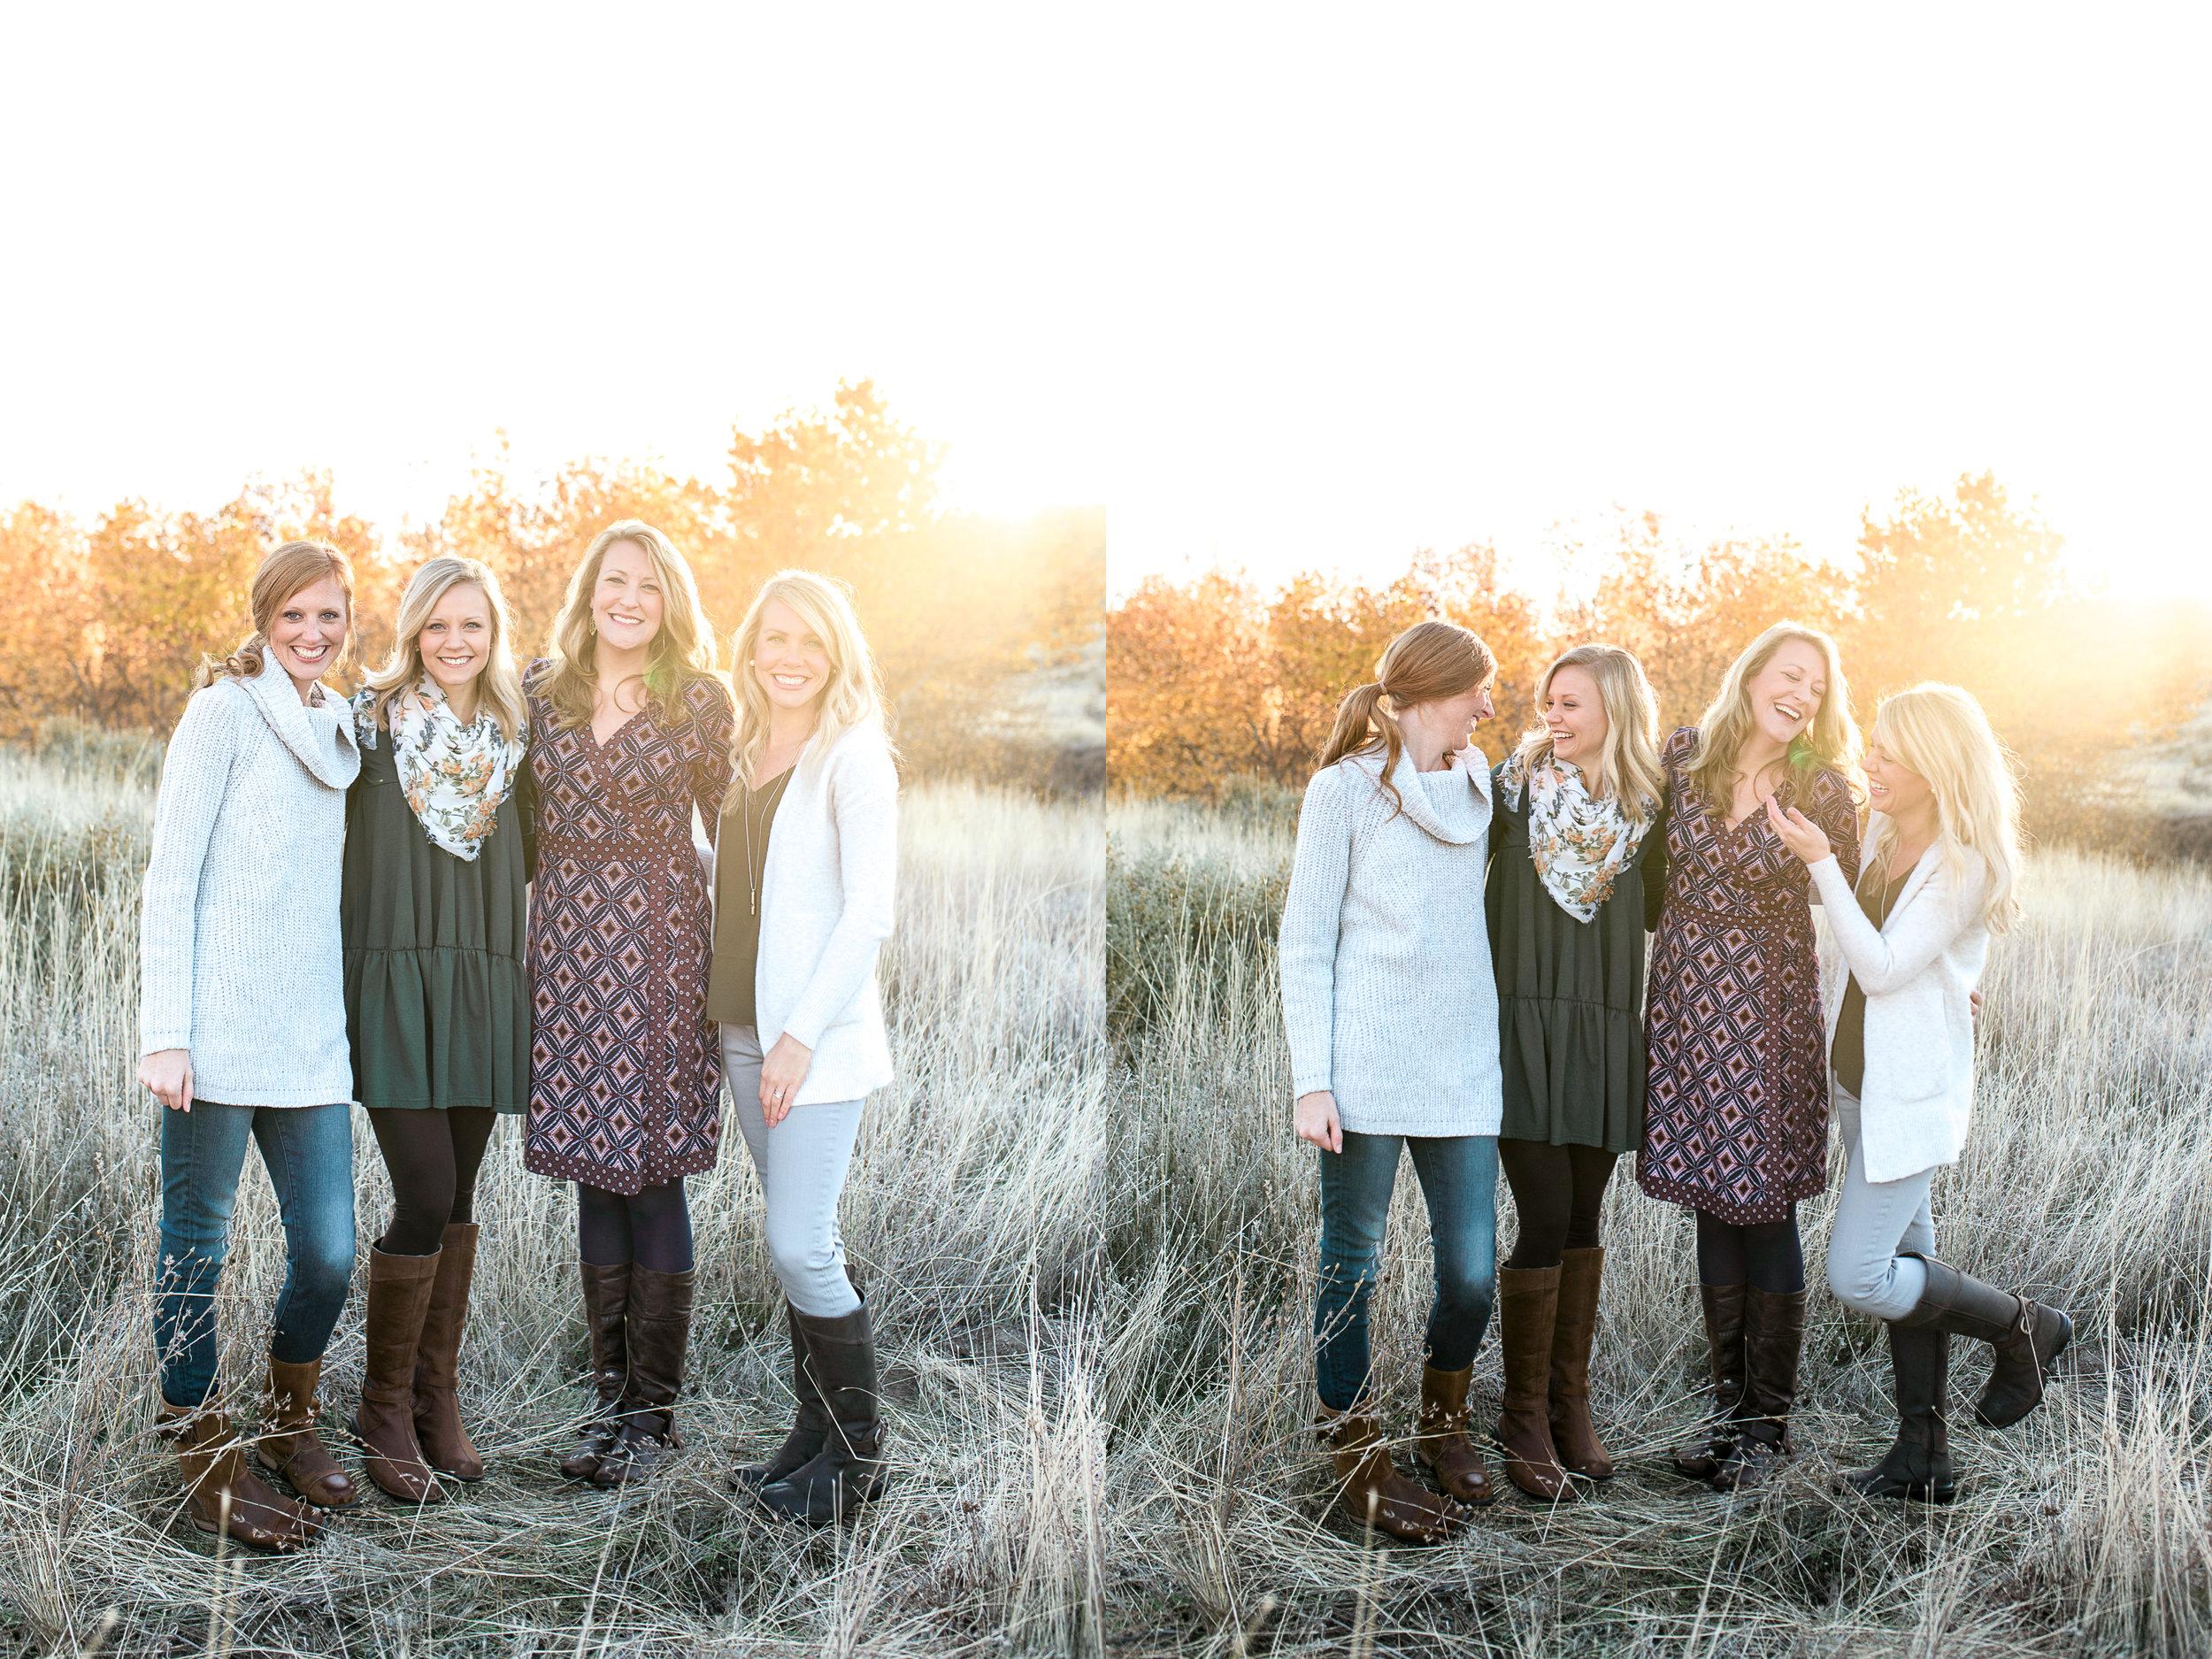 Natalie Koziuk Photography | Boise, ID family photographer | Boise, ID wedding photographer | sisters | nkoziukphotography.com